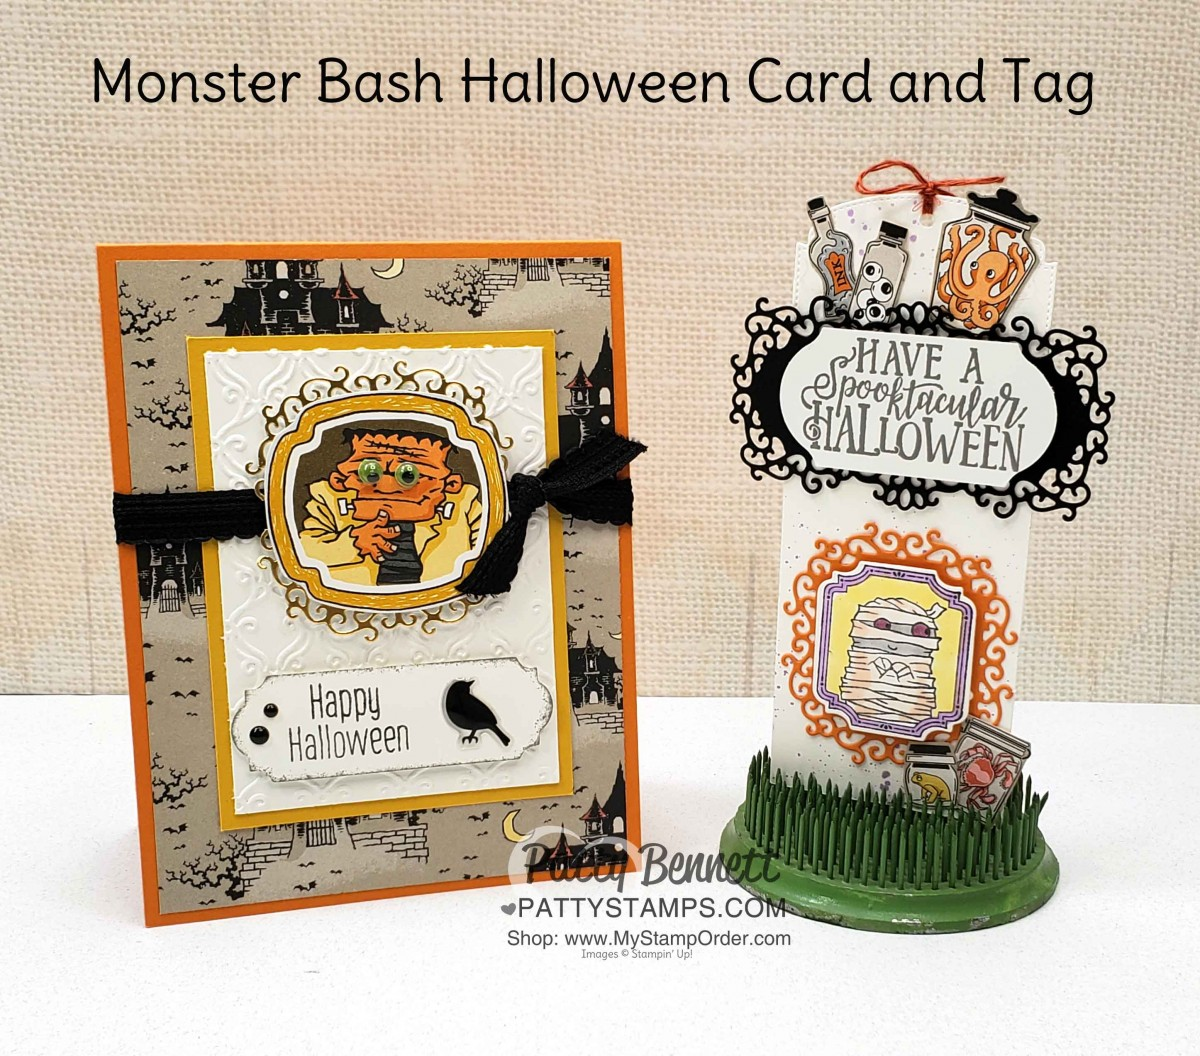 Halloween Monster Bash Card and Tag